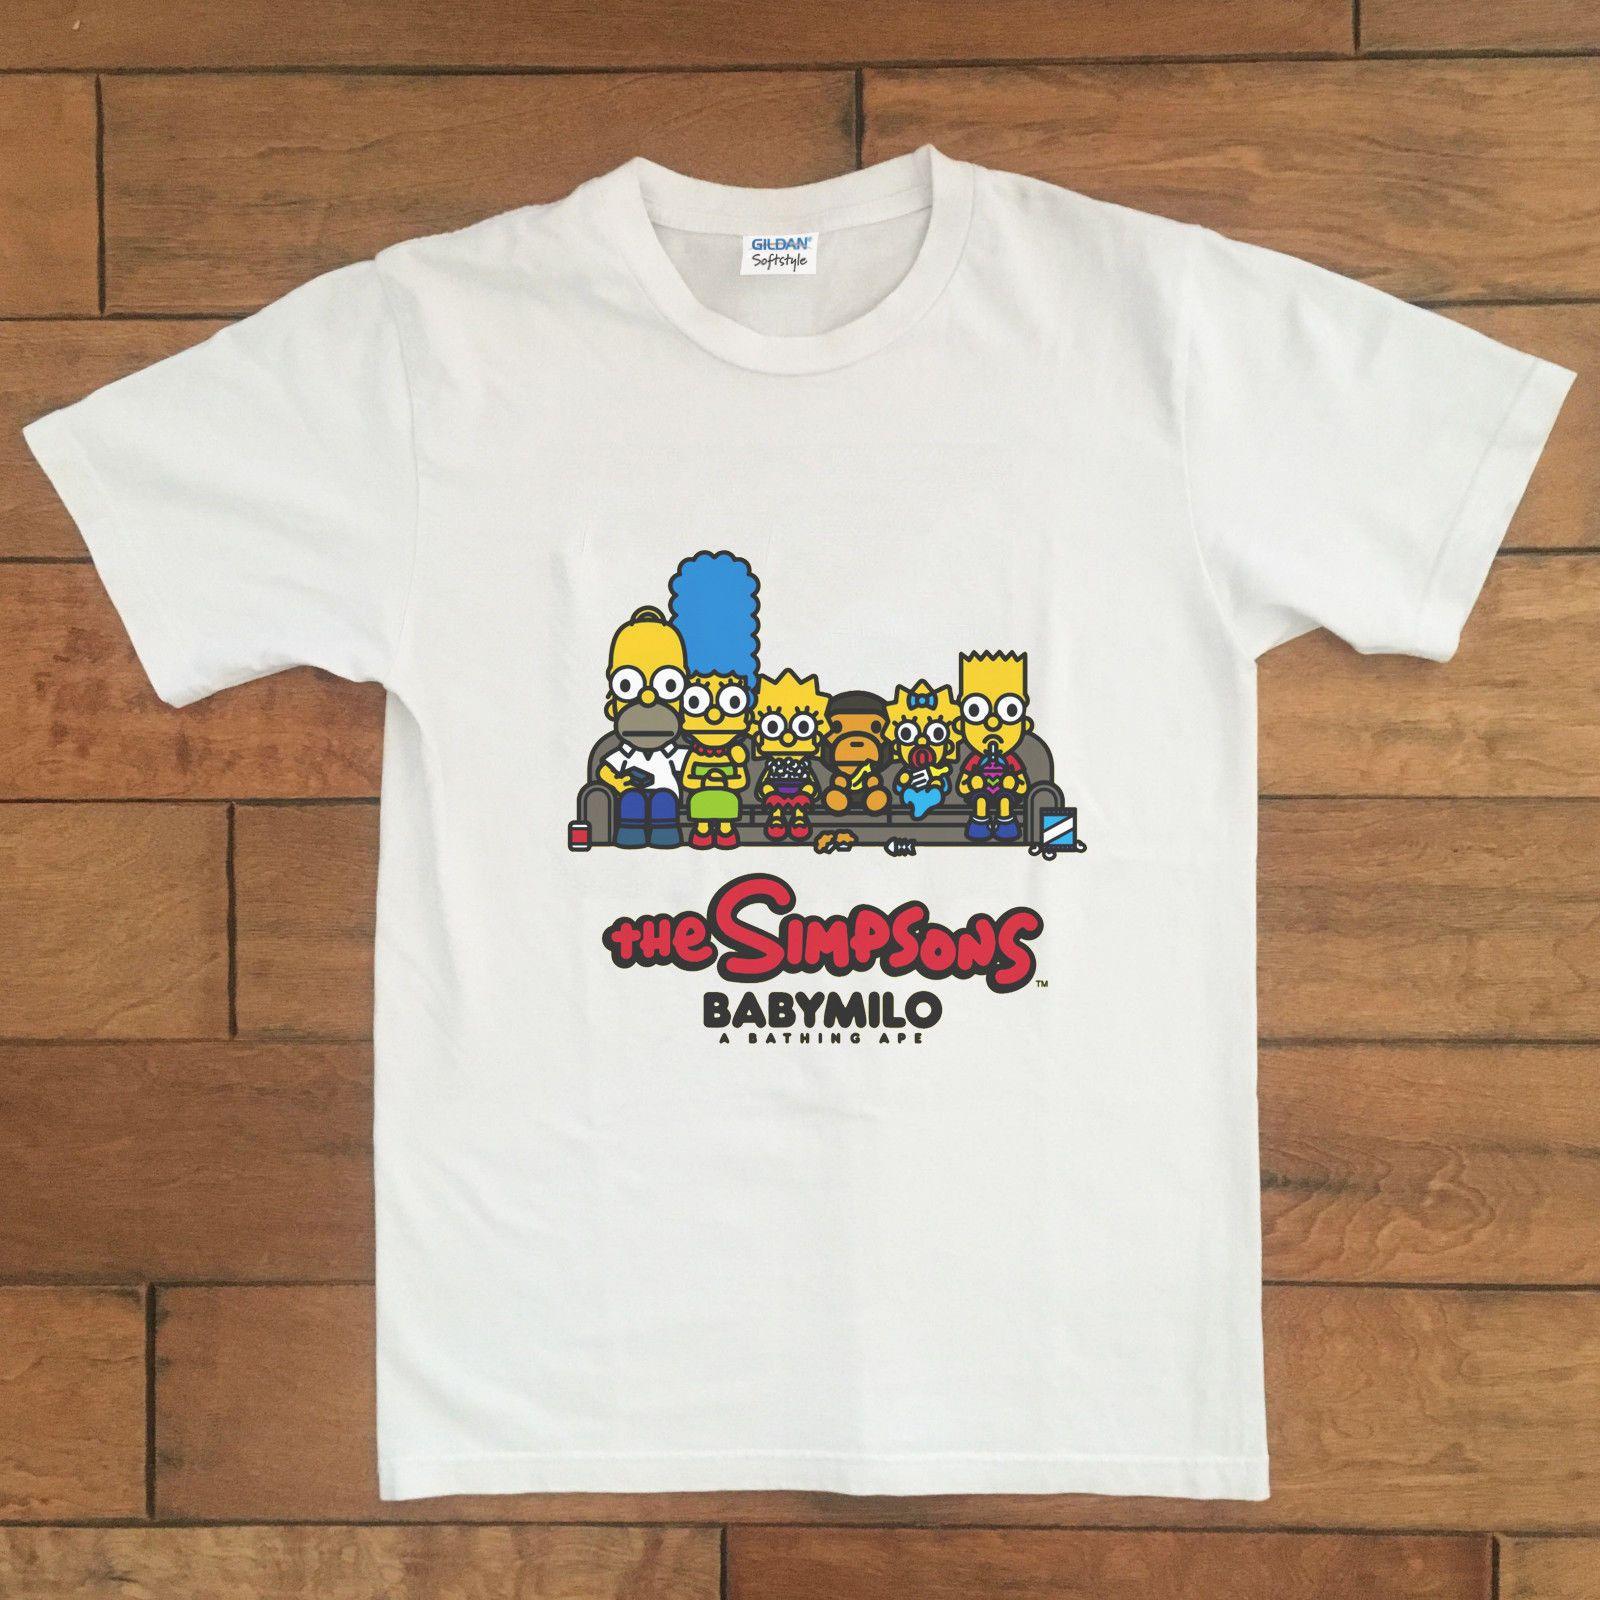 Bootleg The Wholesales Baby Milo Buy T Shirt Sell Reprint Summer Man  T-Shirt Tops Tees New Print Tee Men Short Sleeve Clothing